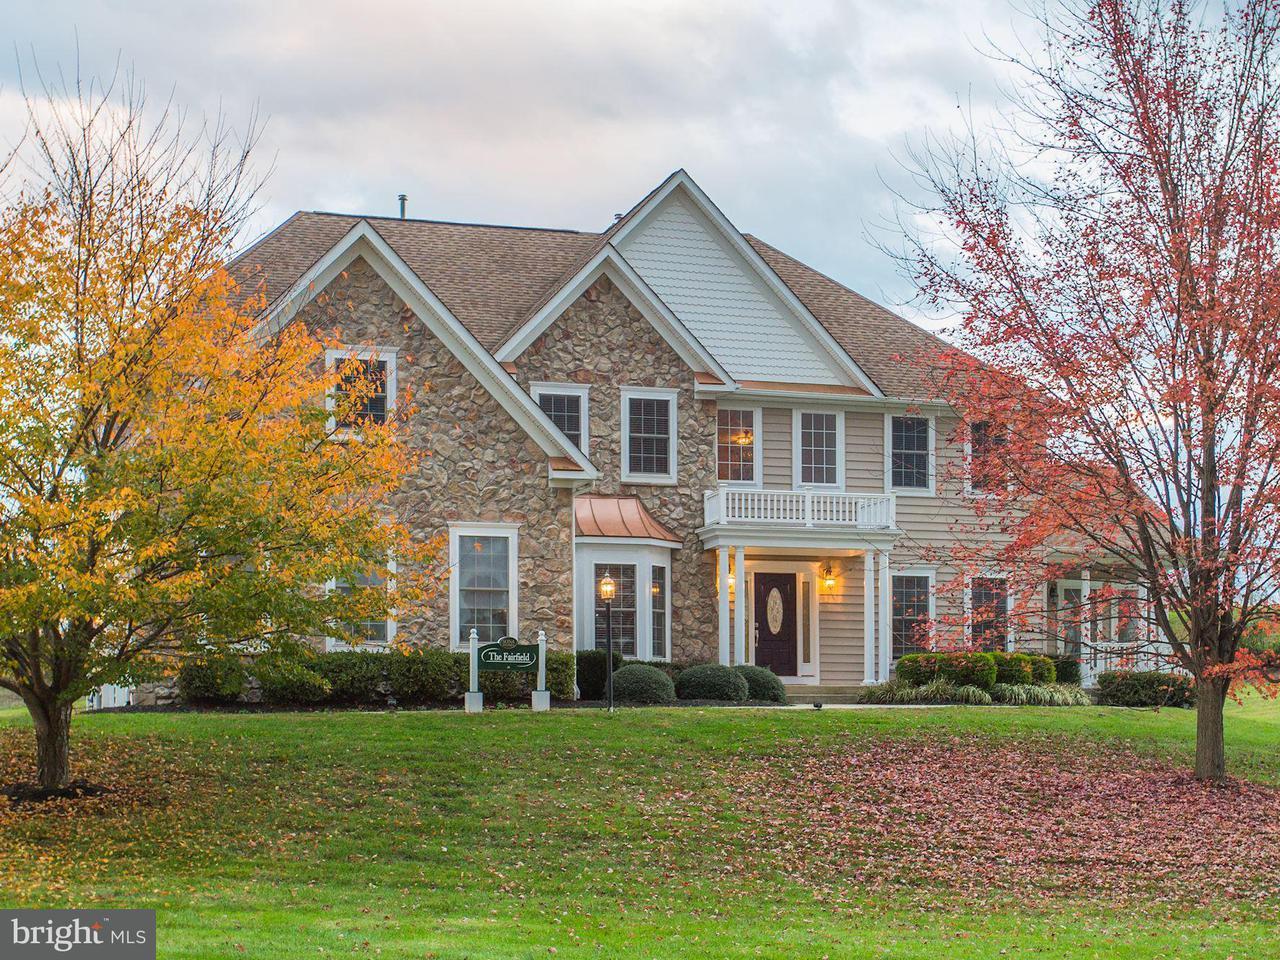 Single Family Home for Sale at 10314 Limestone Avenue 10314 Limestone Avenue Culpeper, Virginia 22701 United States